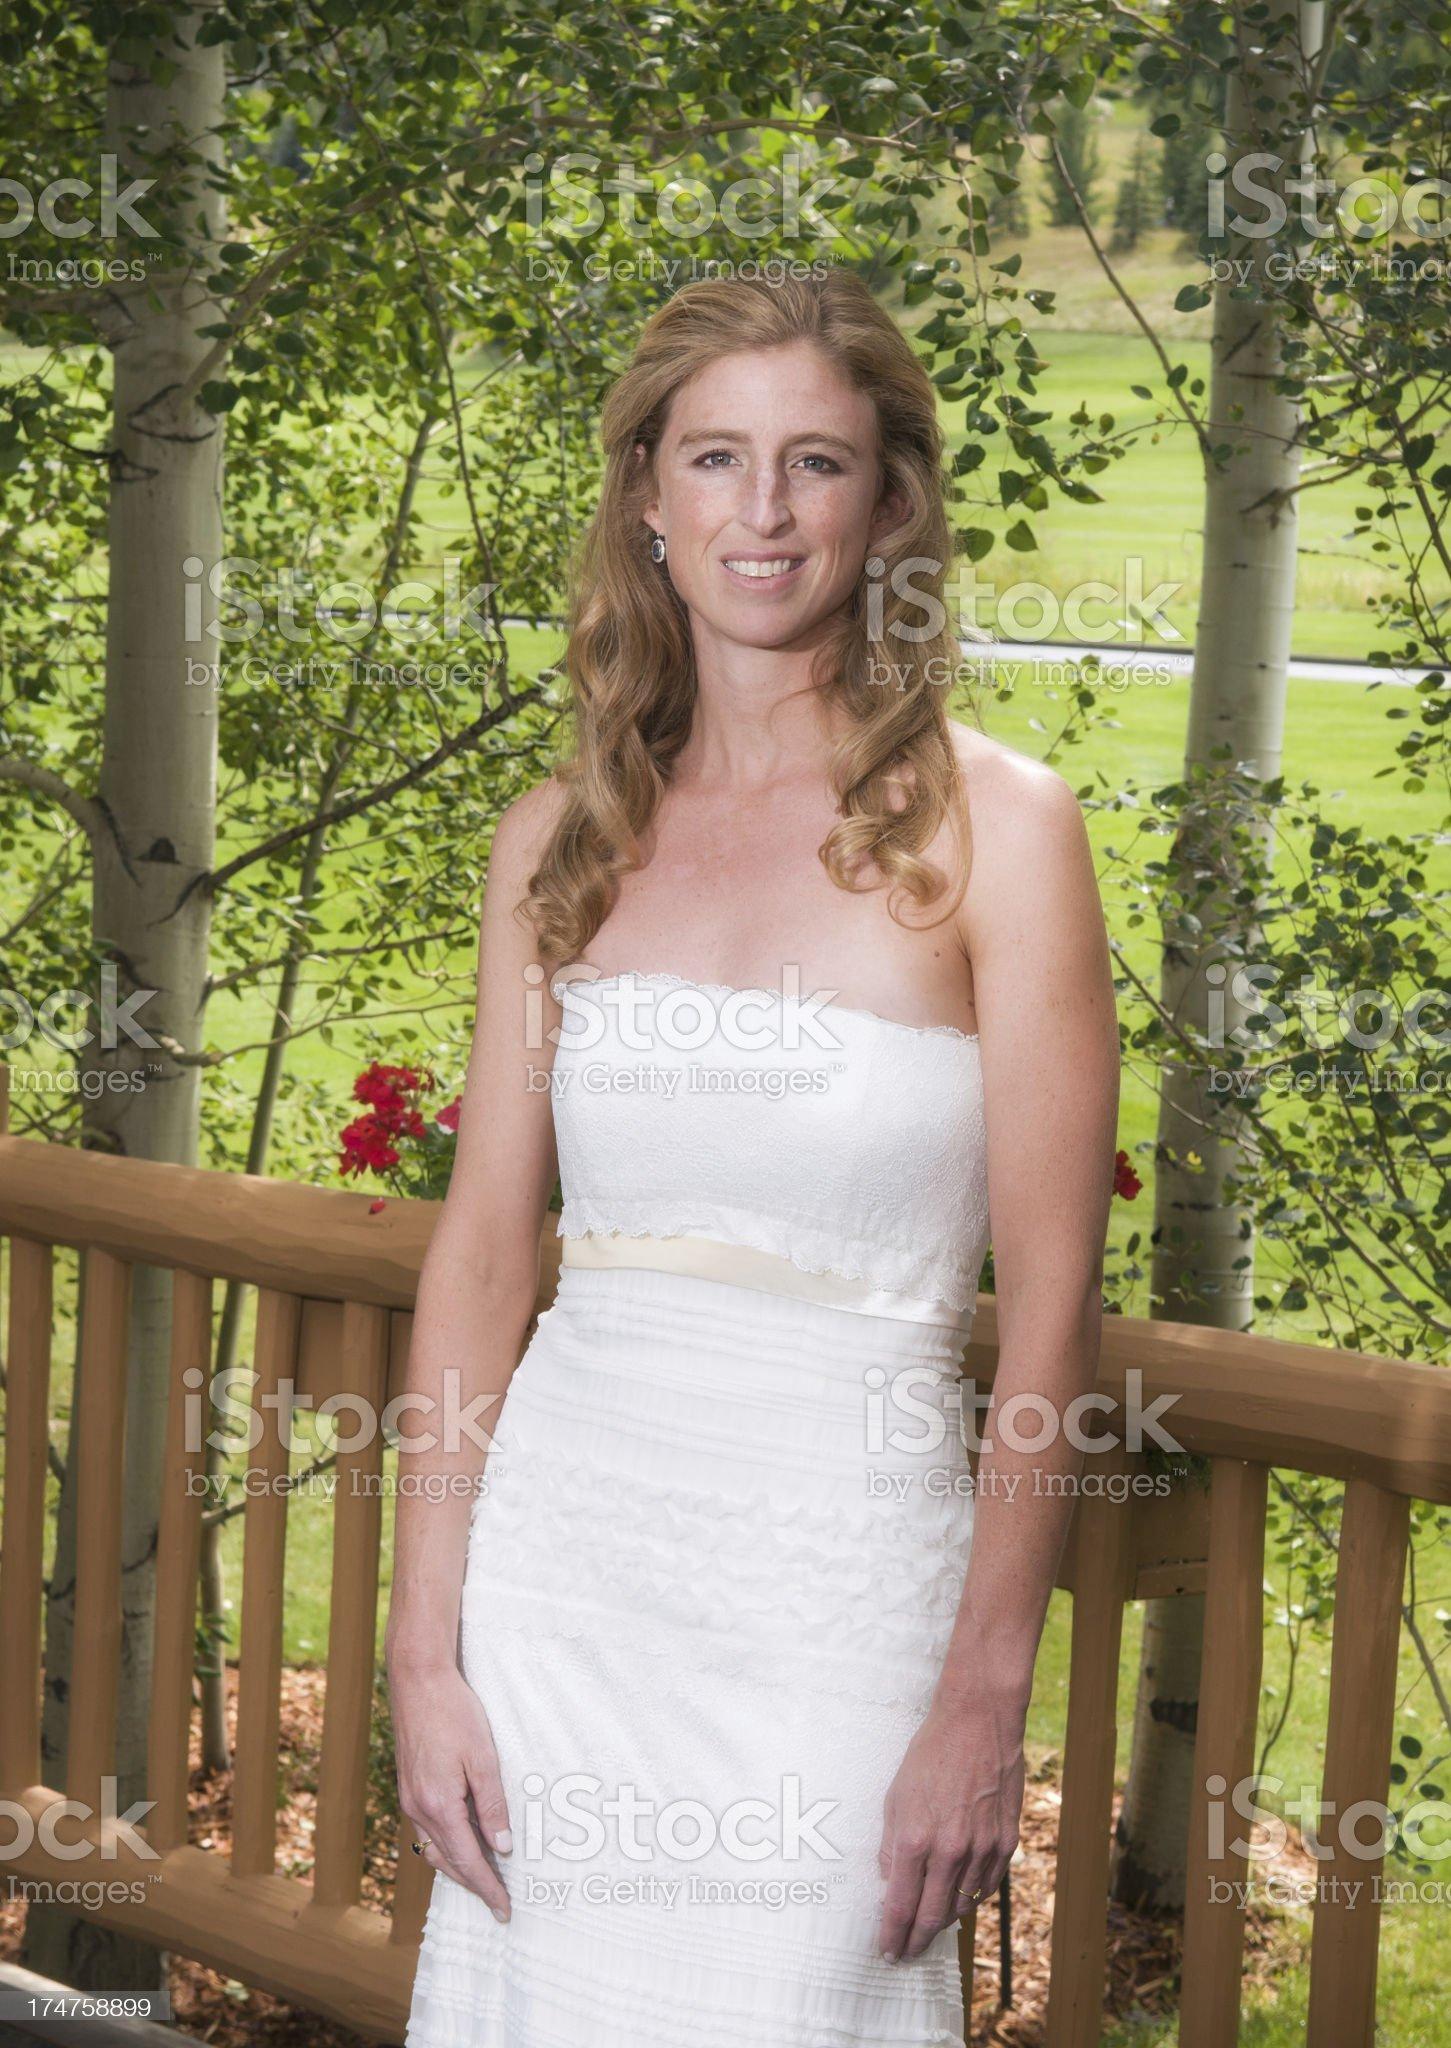 Bride Outdoor Portrait royalty-free stock photo